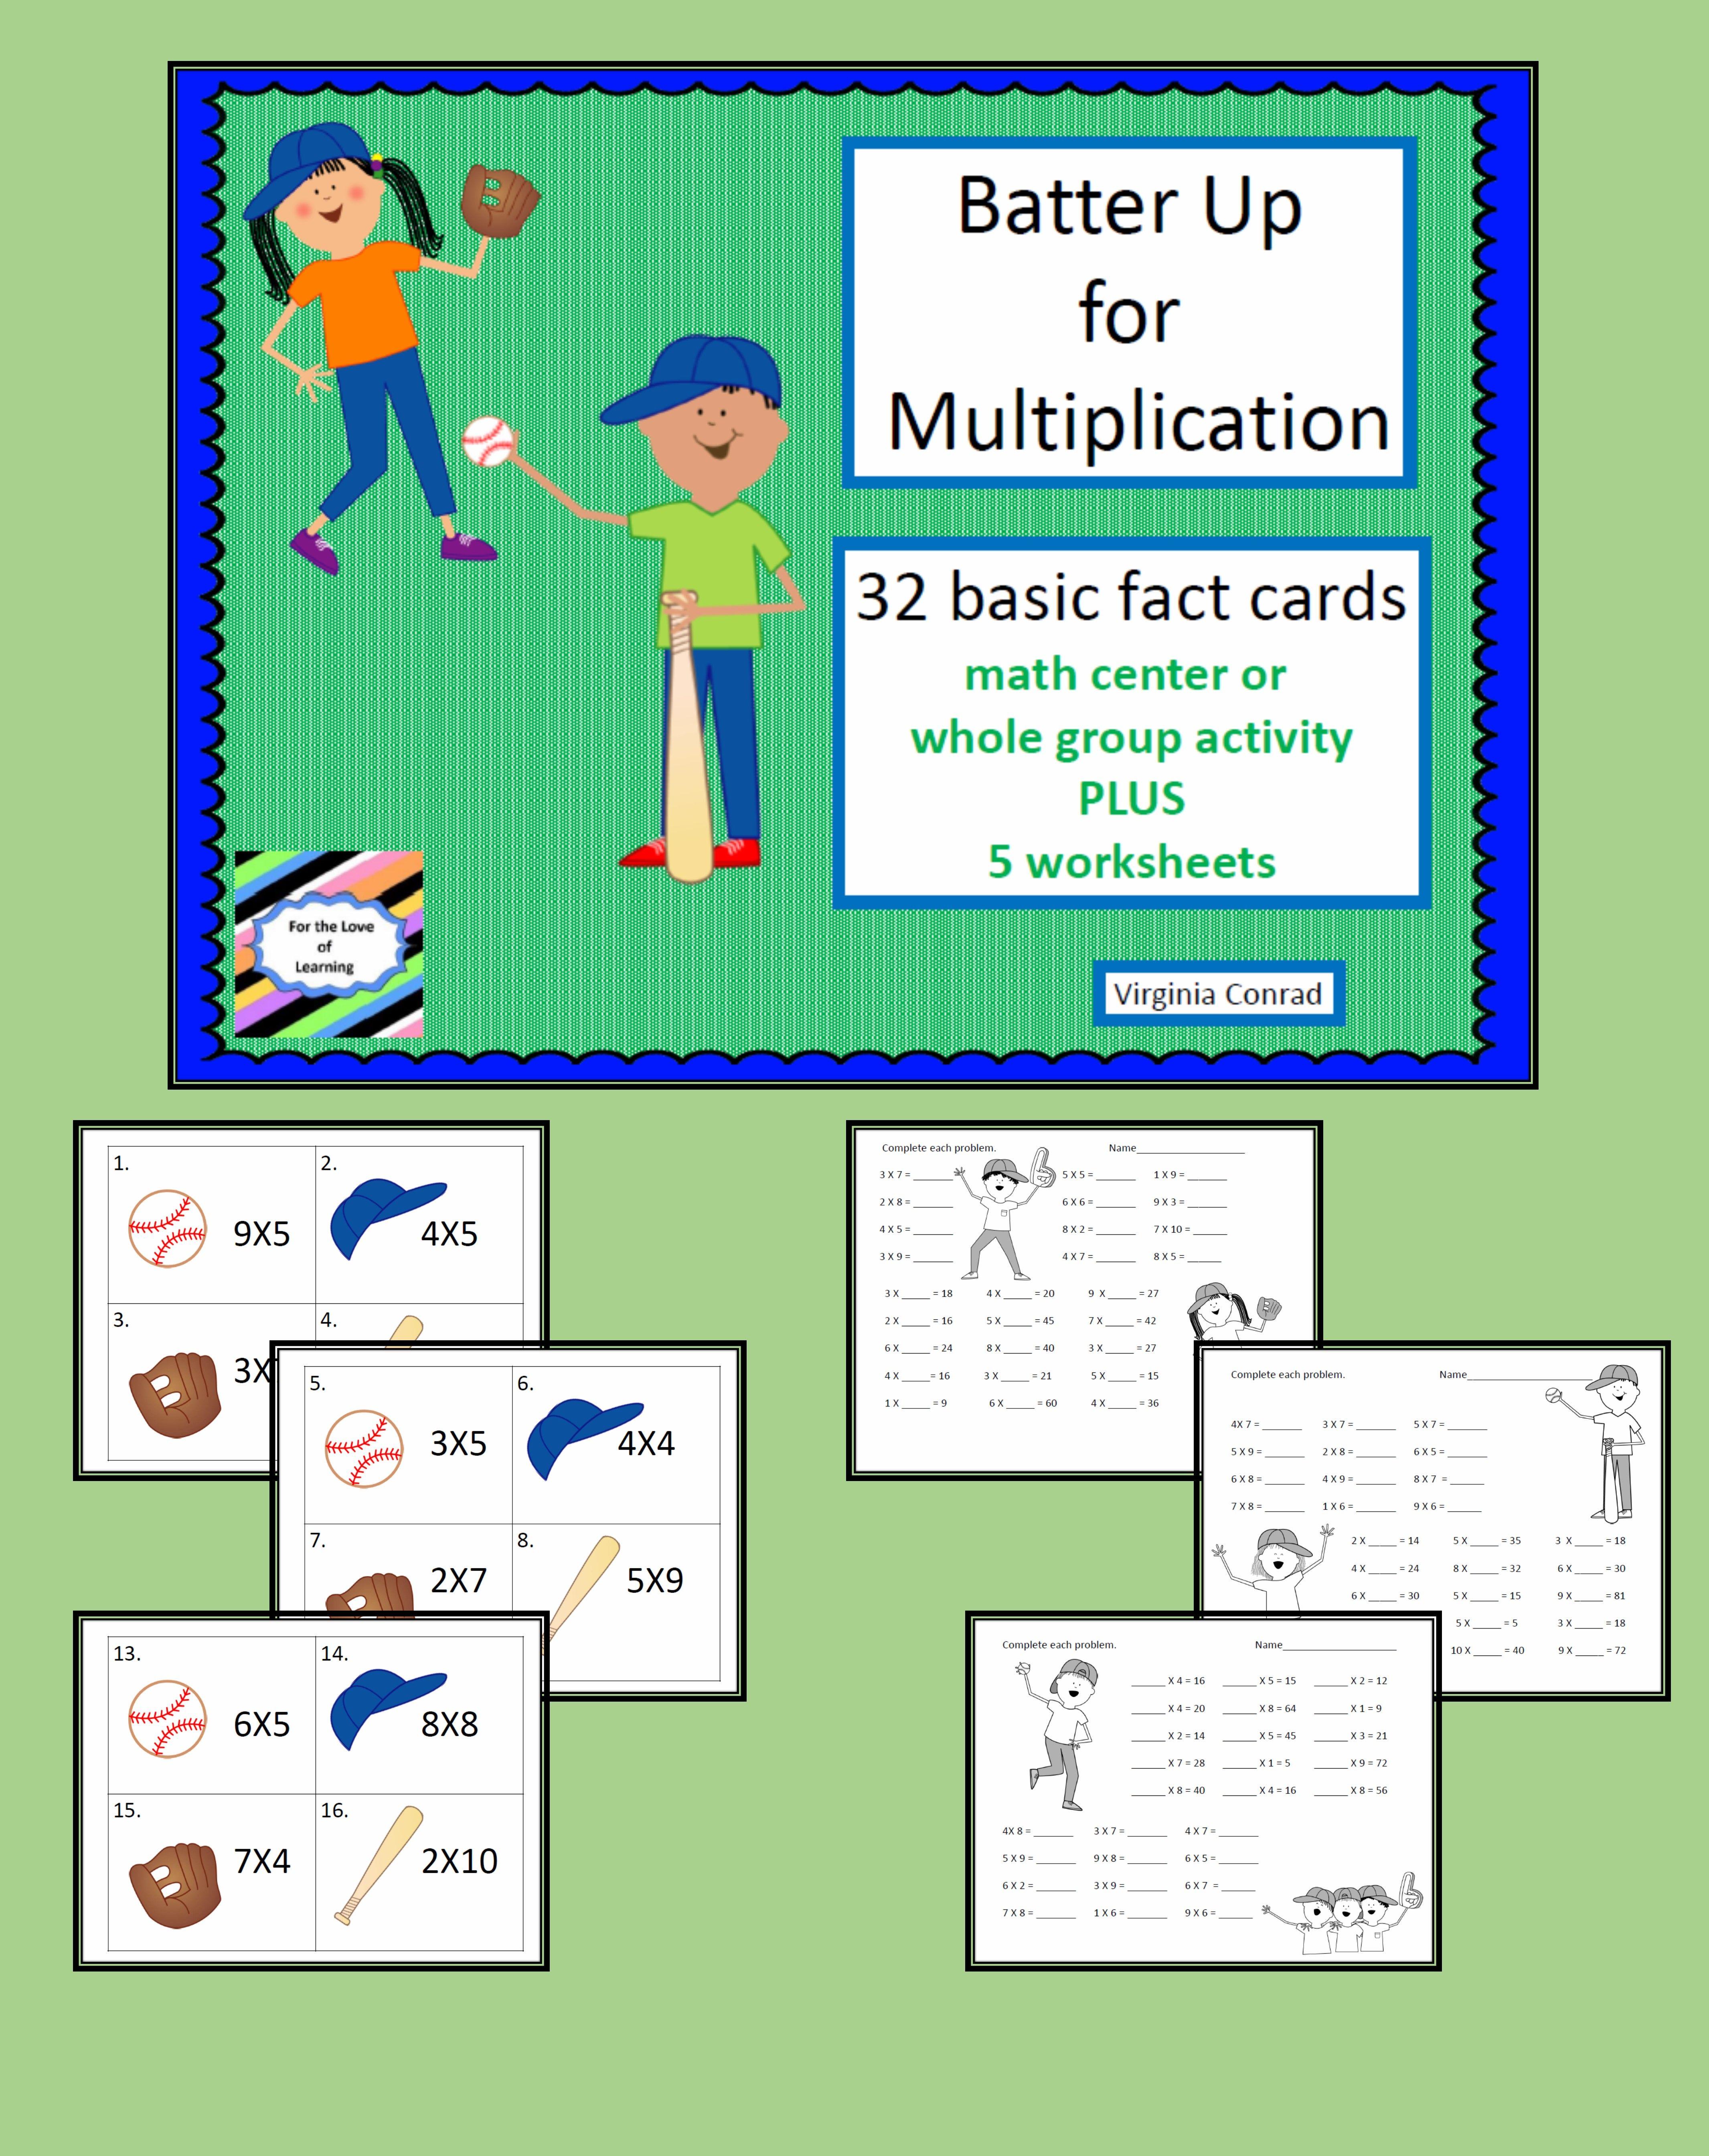 Multiplication Facts Batter Up